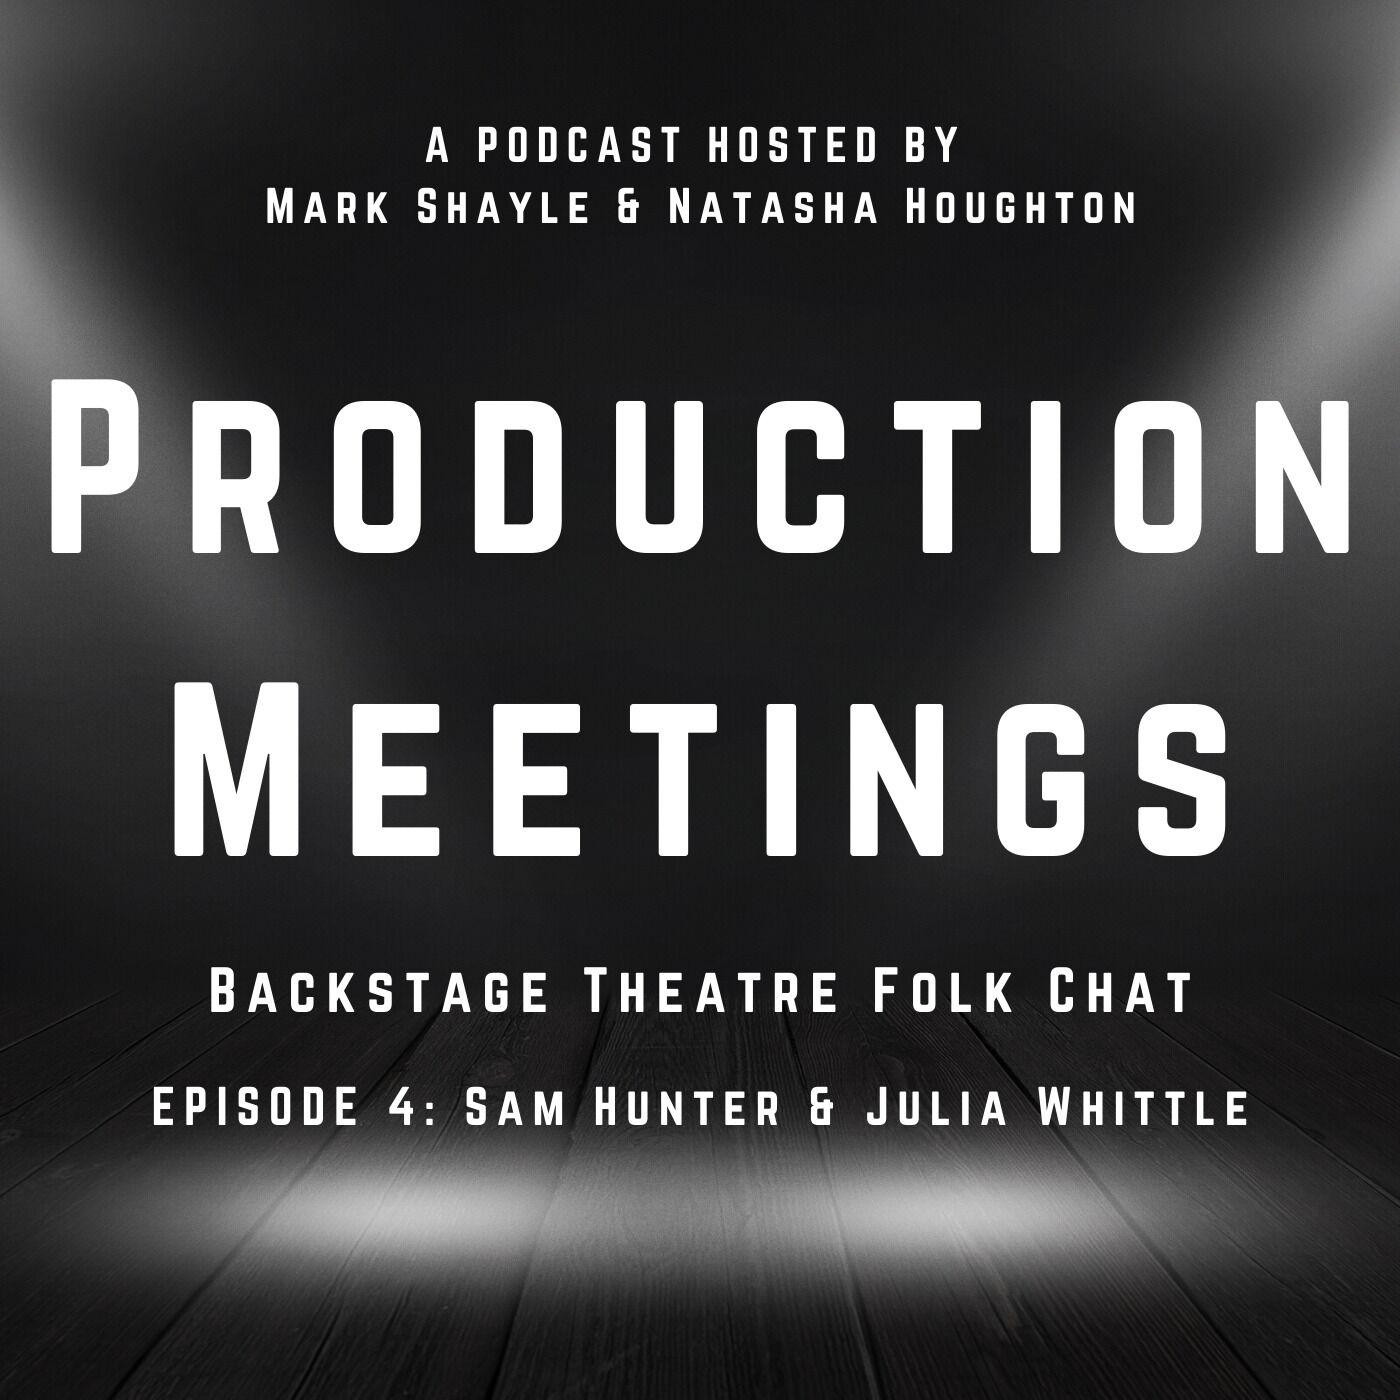 004 - Sam Hunter and Julia Whittle